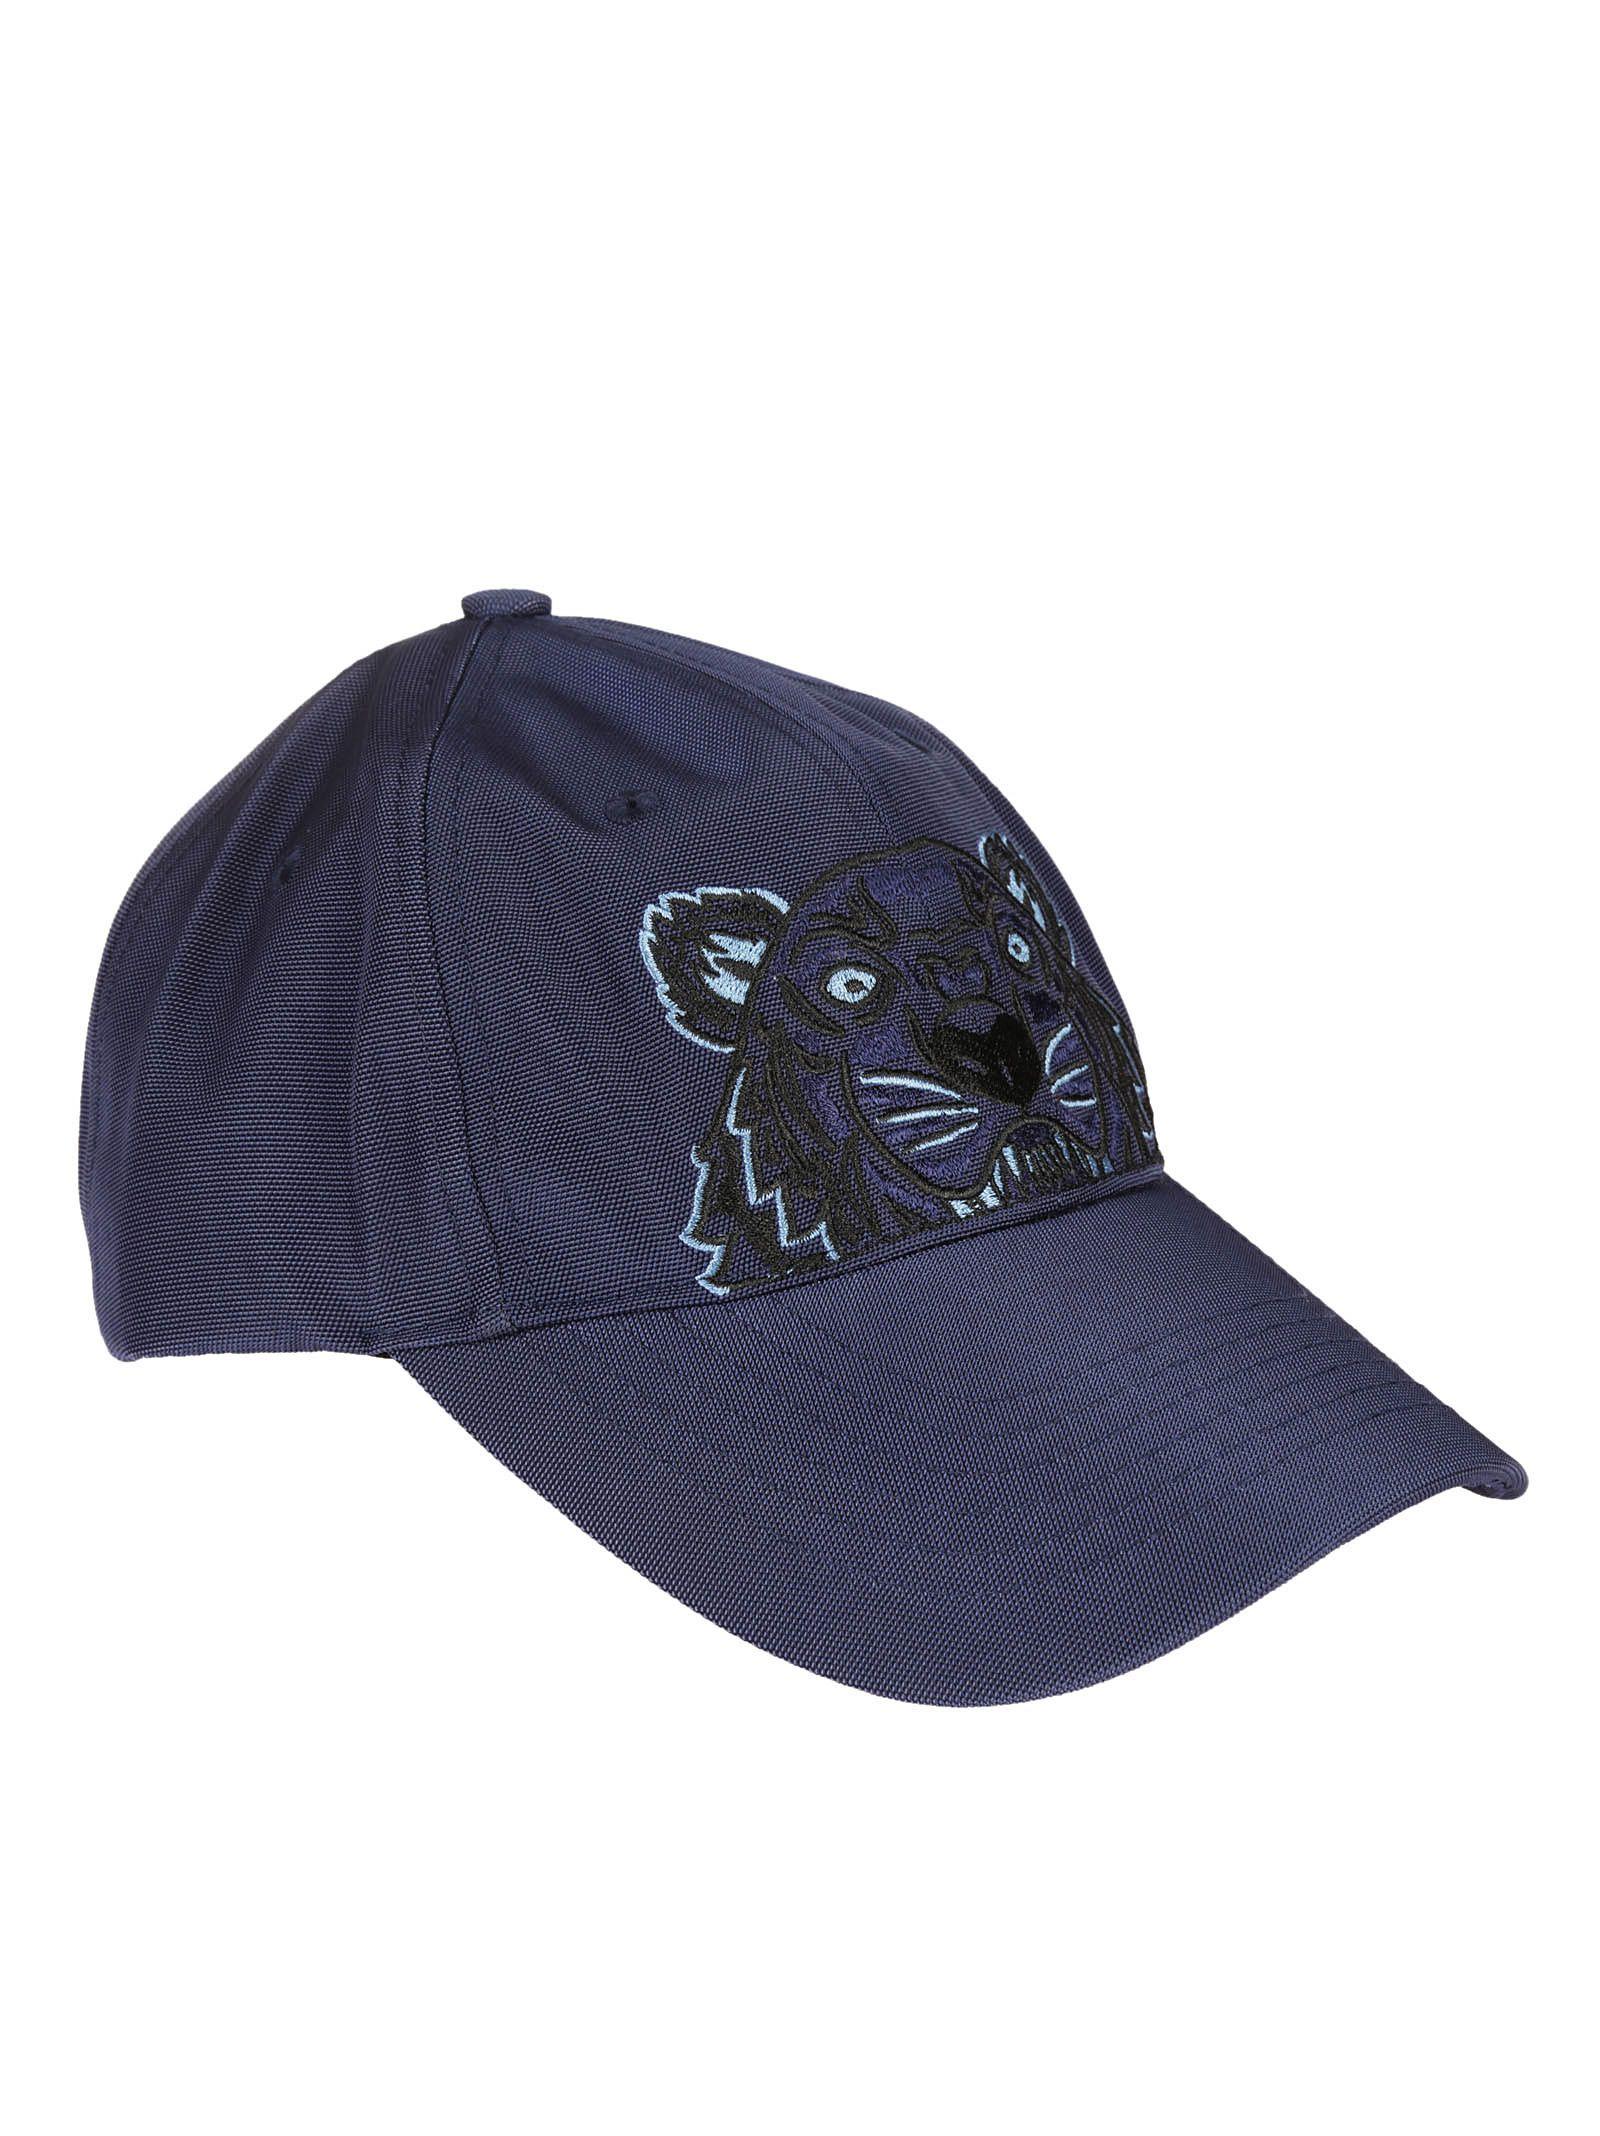 Kenzo Kenzo Tiger Canvas Cap - Blue - 8136644  338080215e7